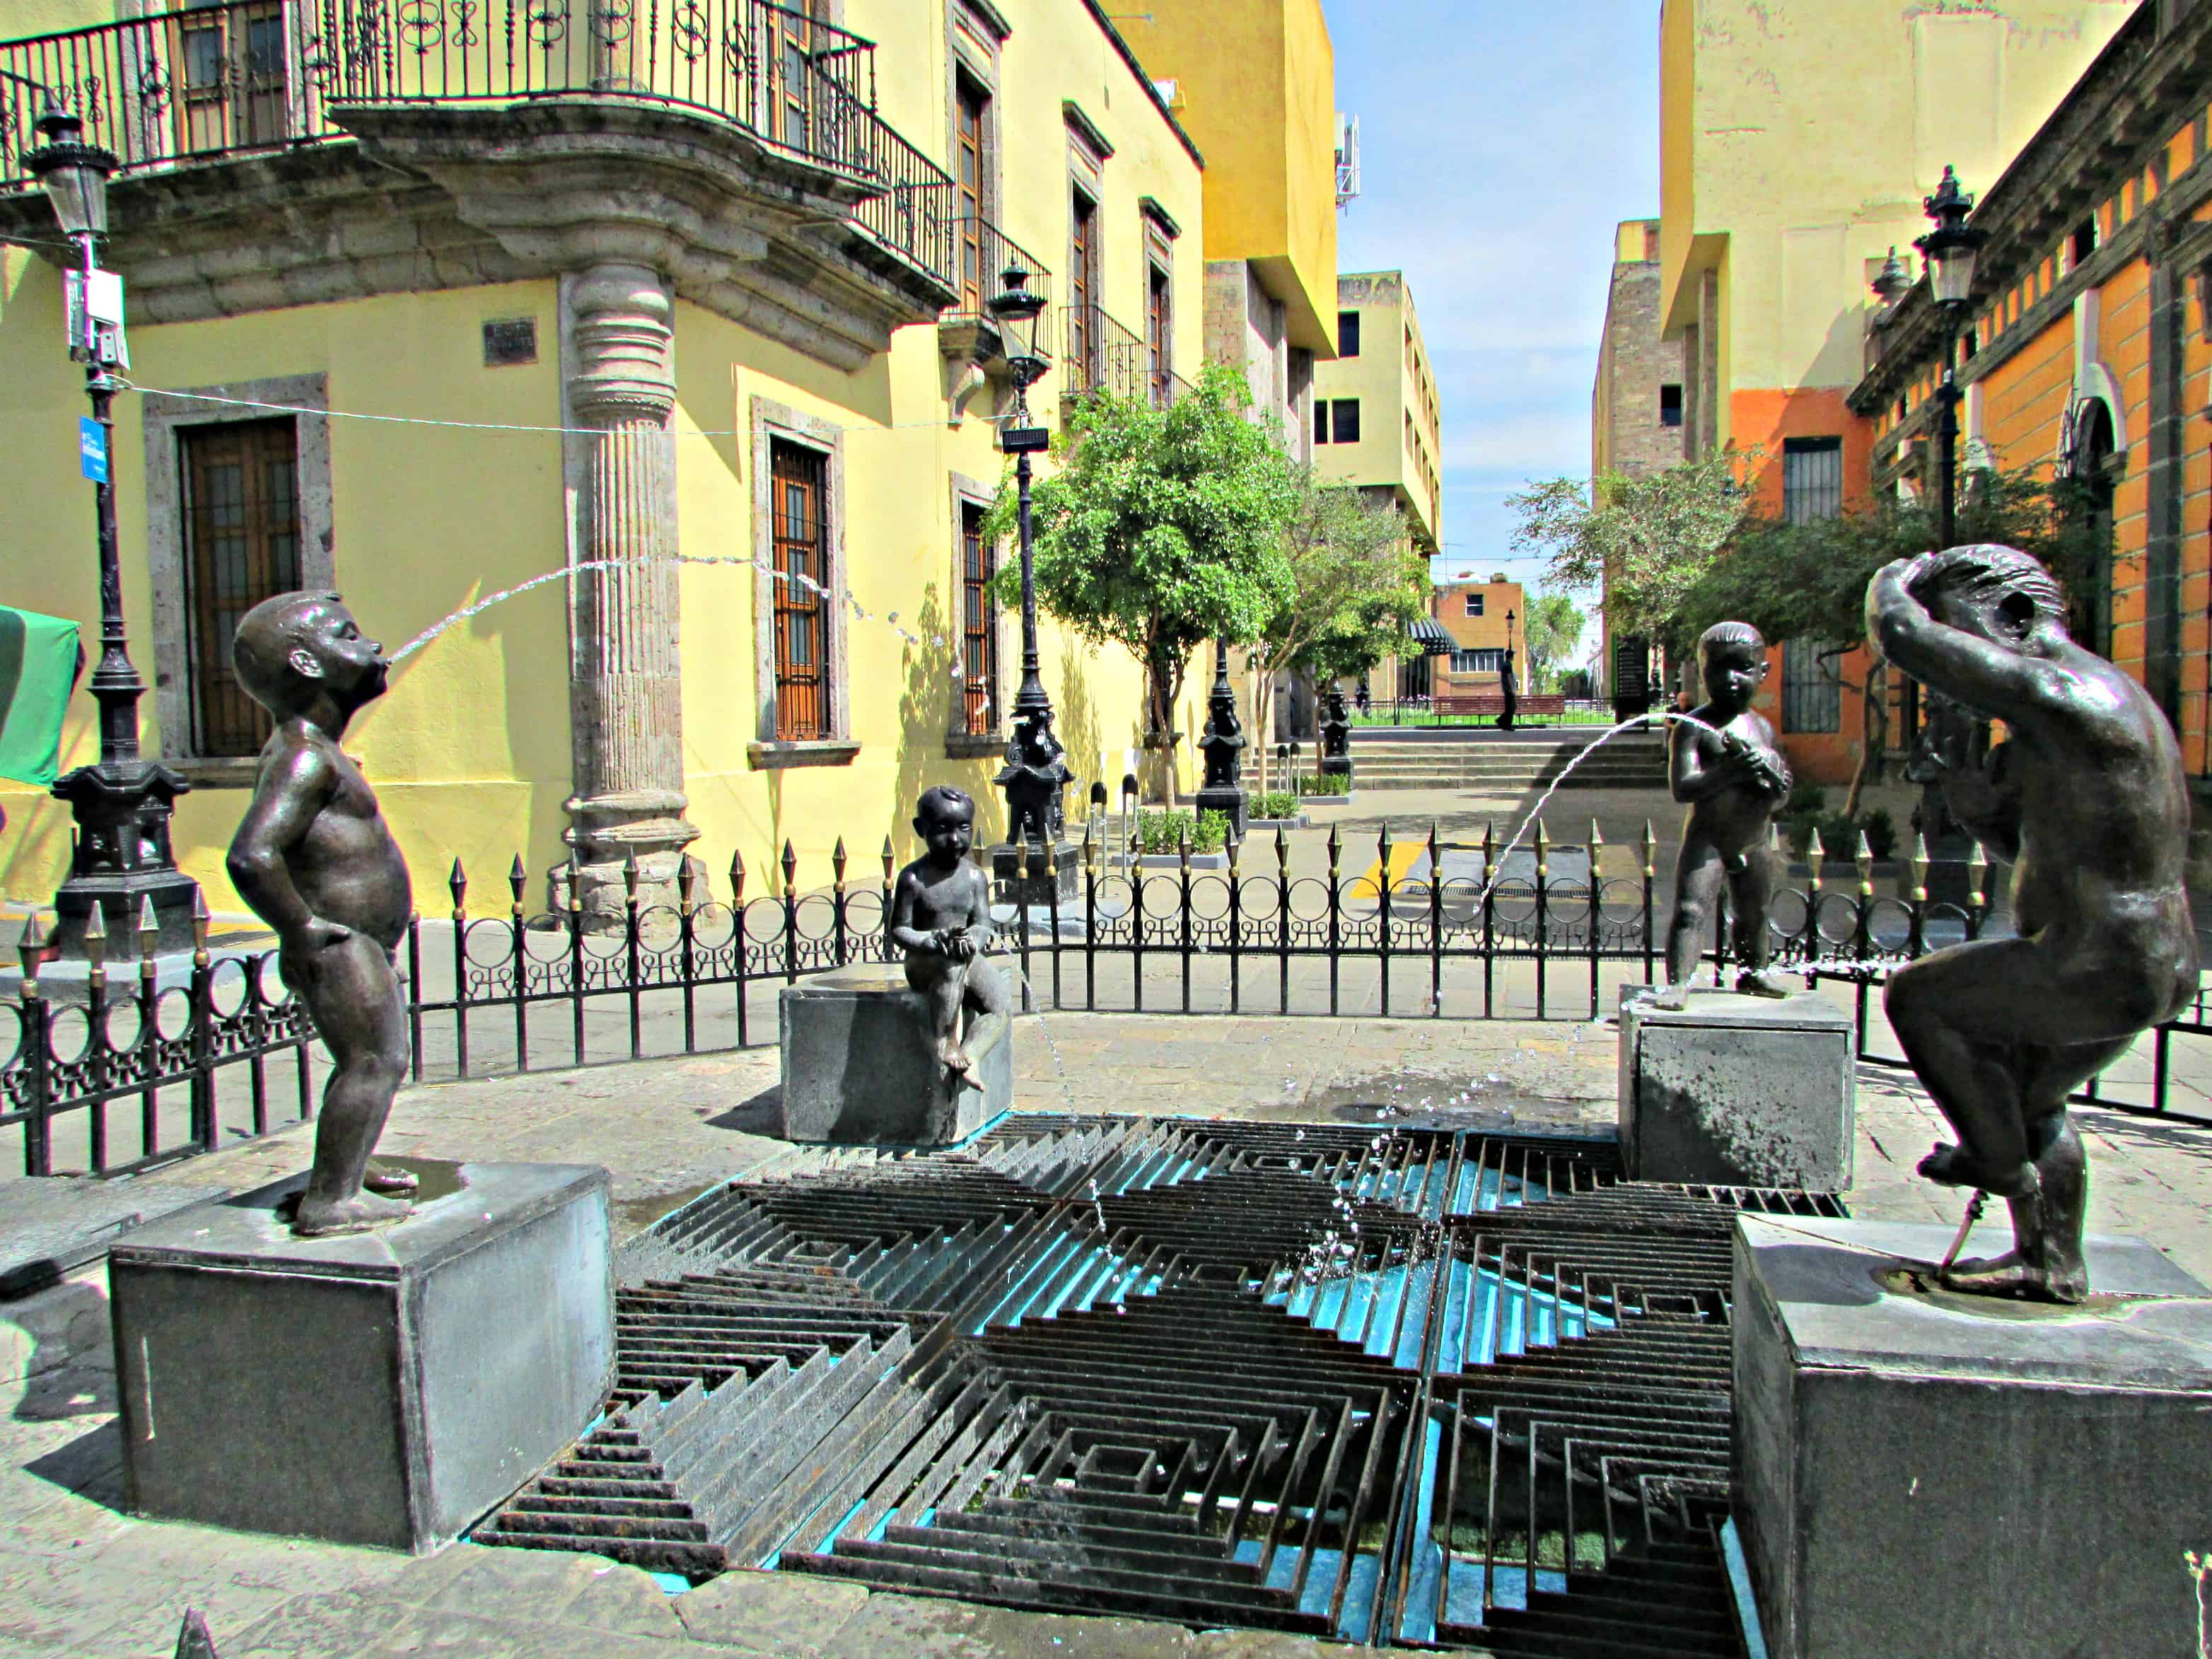 Children's Fountain Guadalajara